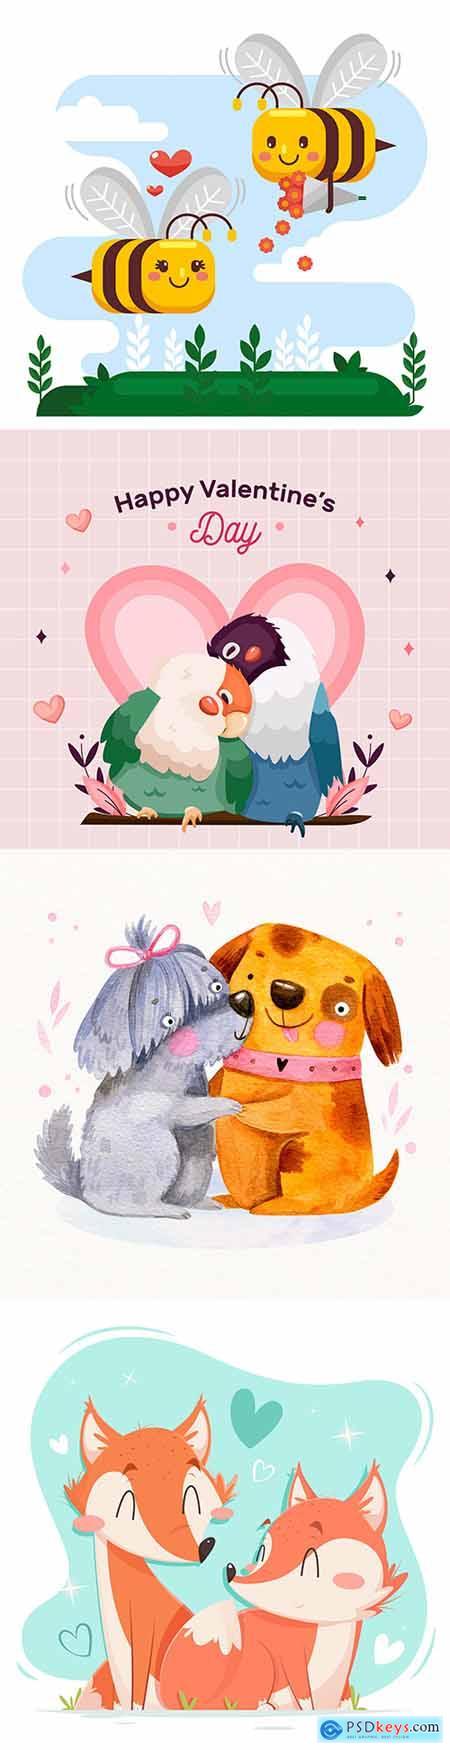 Valentines Day romantic pair cartoon animal illustration